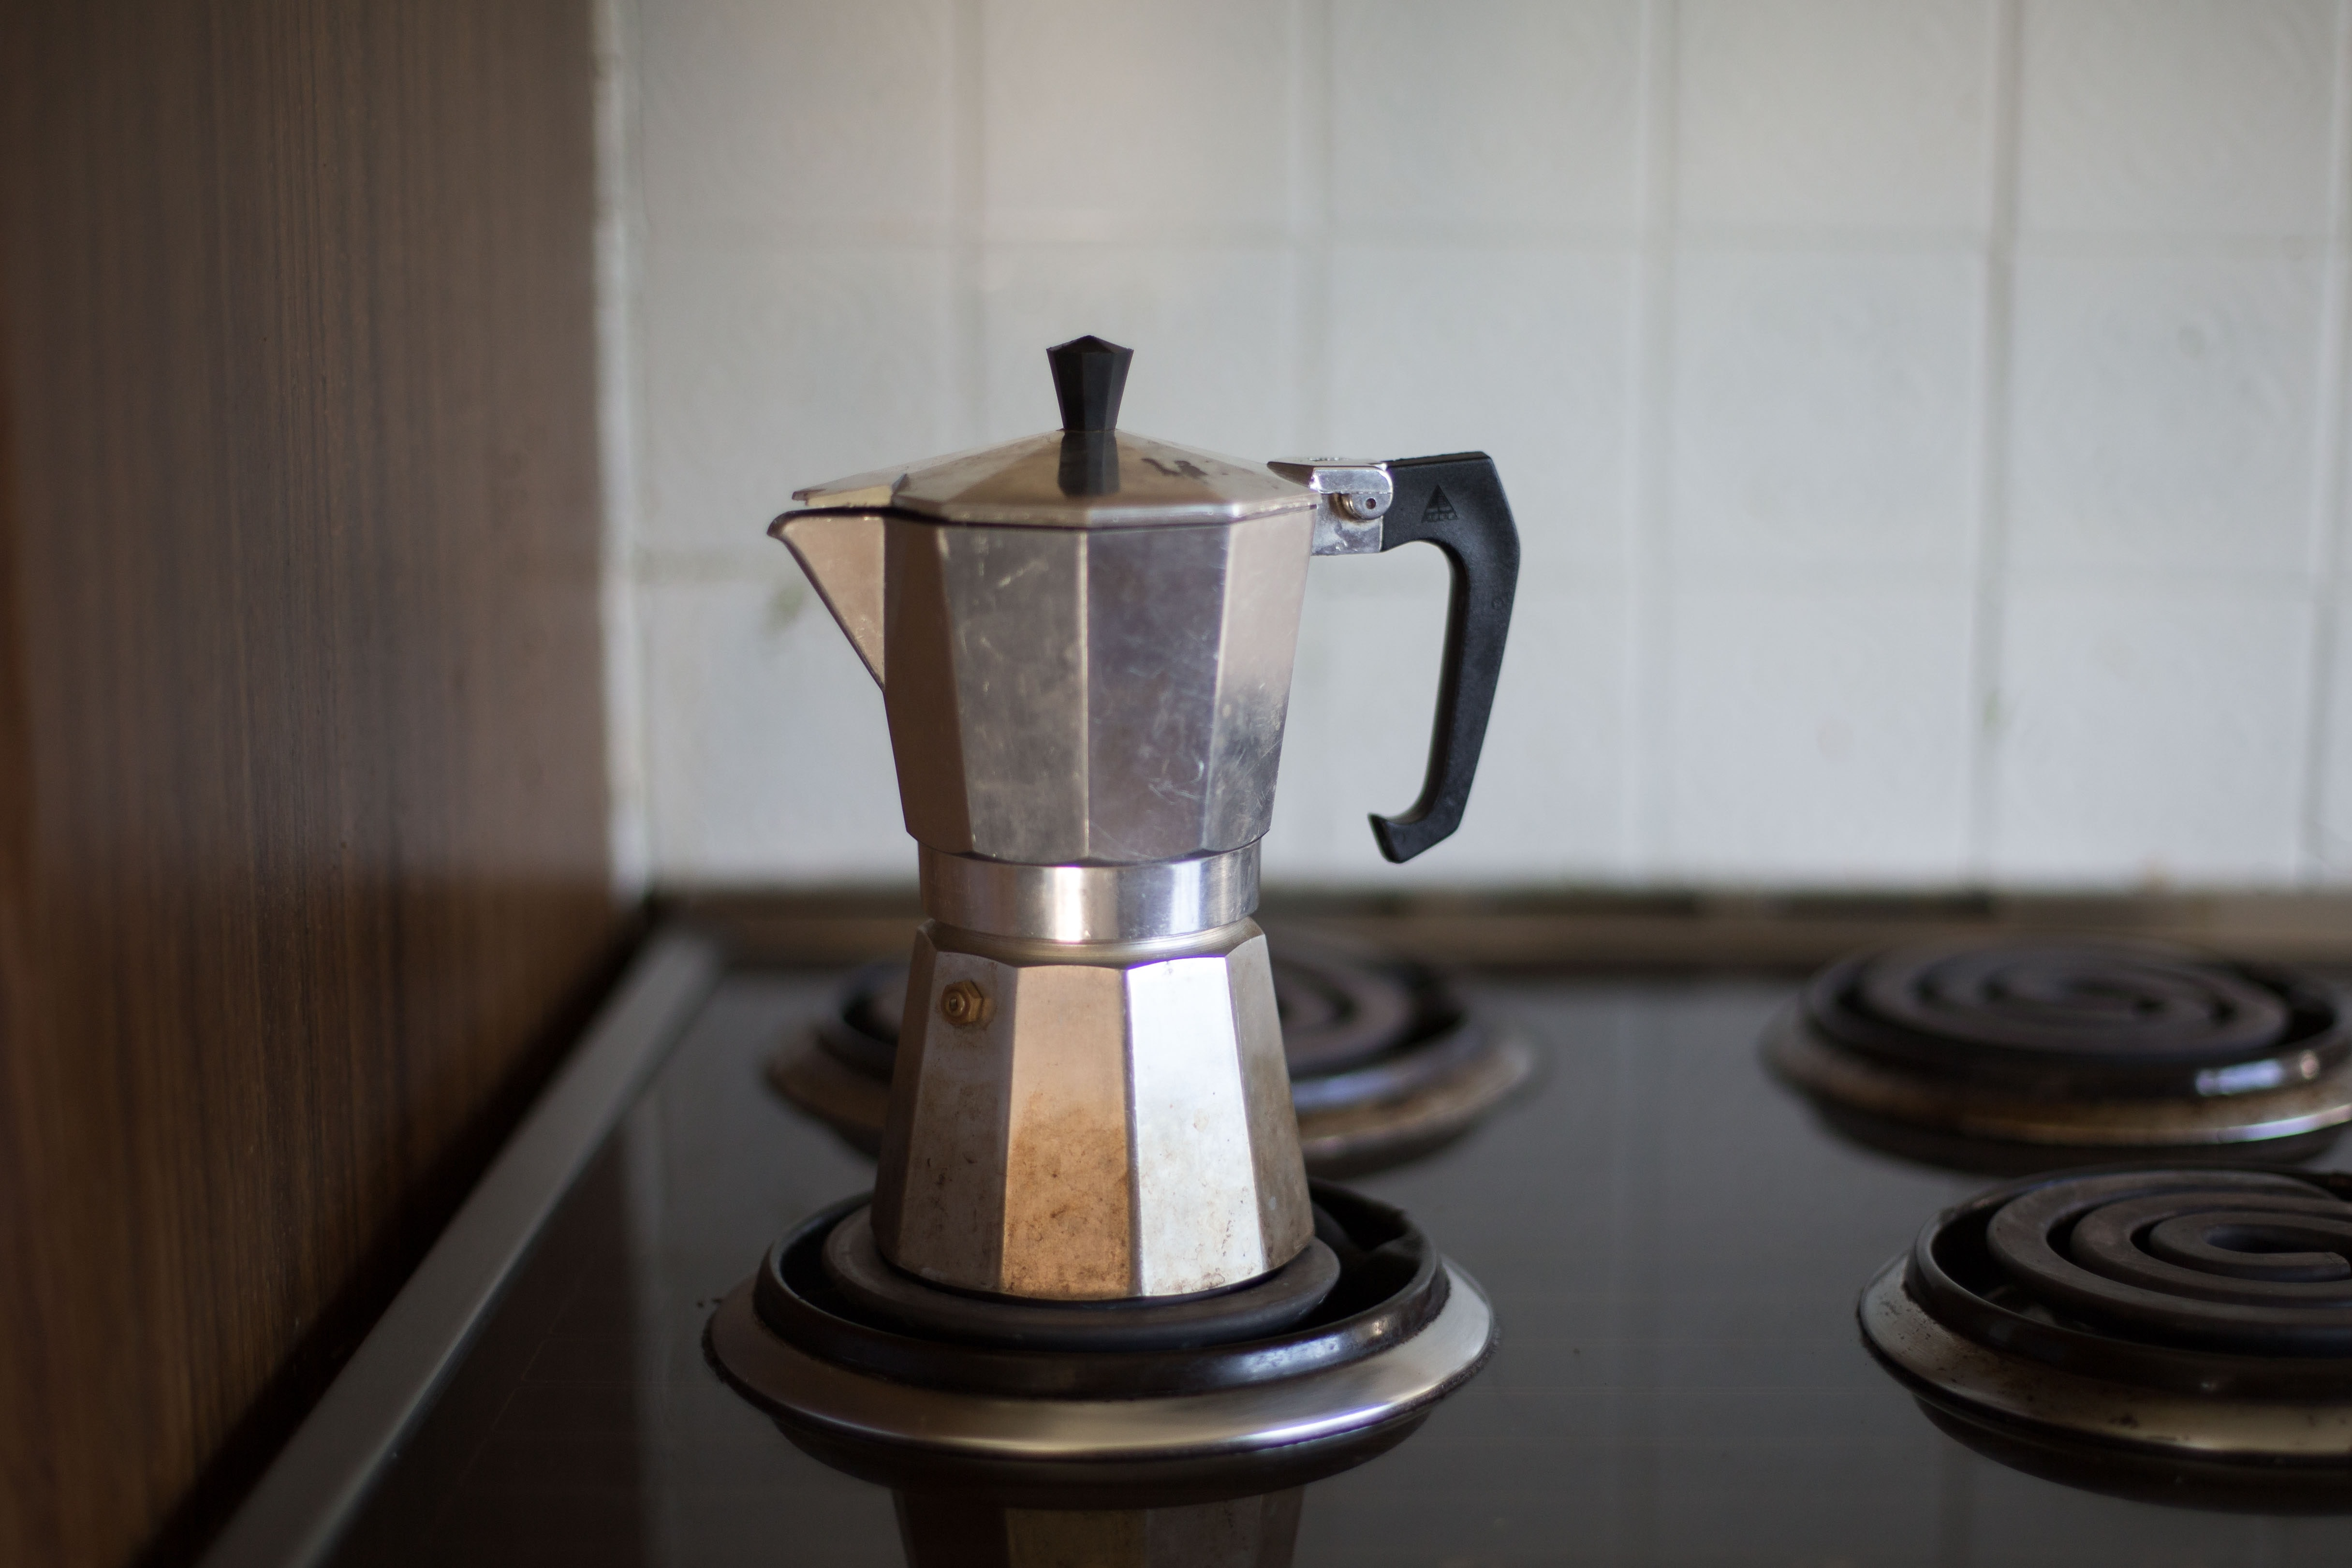 gray moka pot on electric coil stove selective focus photo